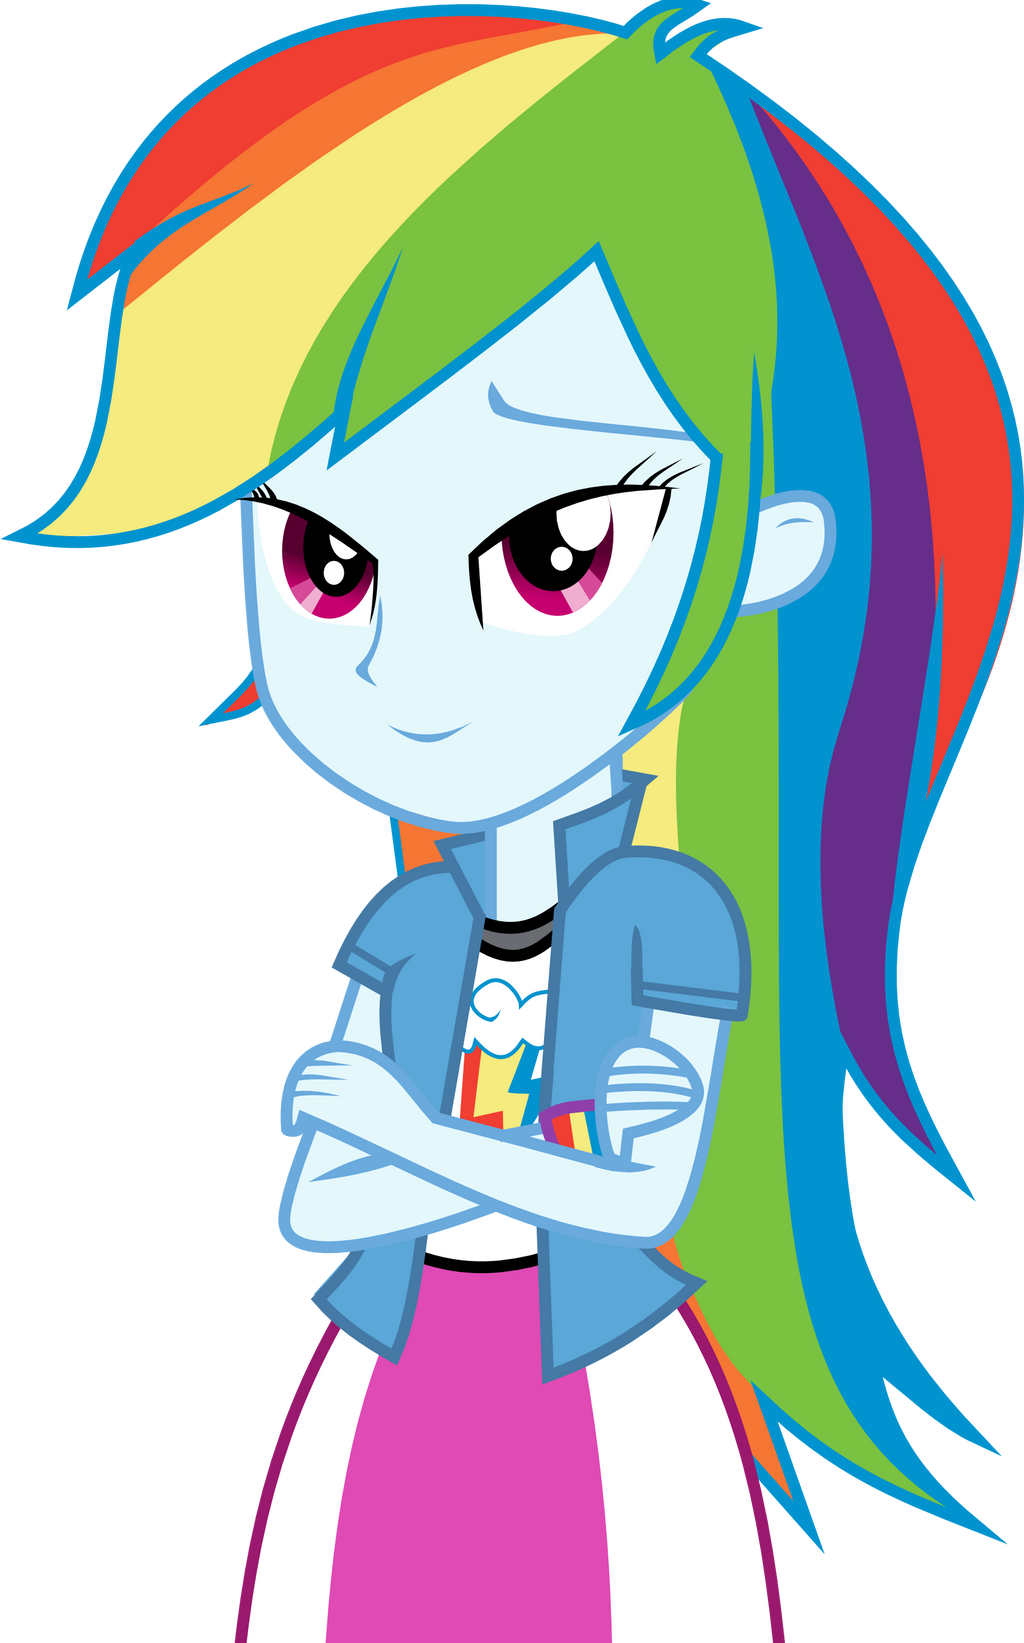 Equestria Girls Rainbow Dash By Nero Narmeril